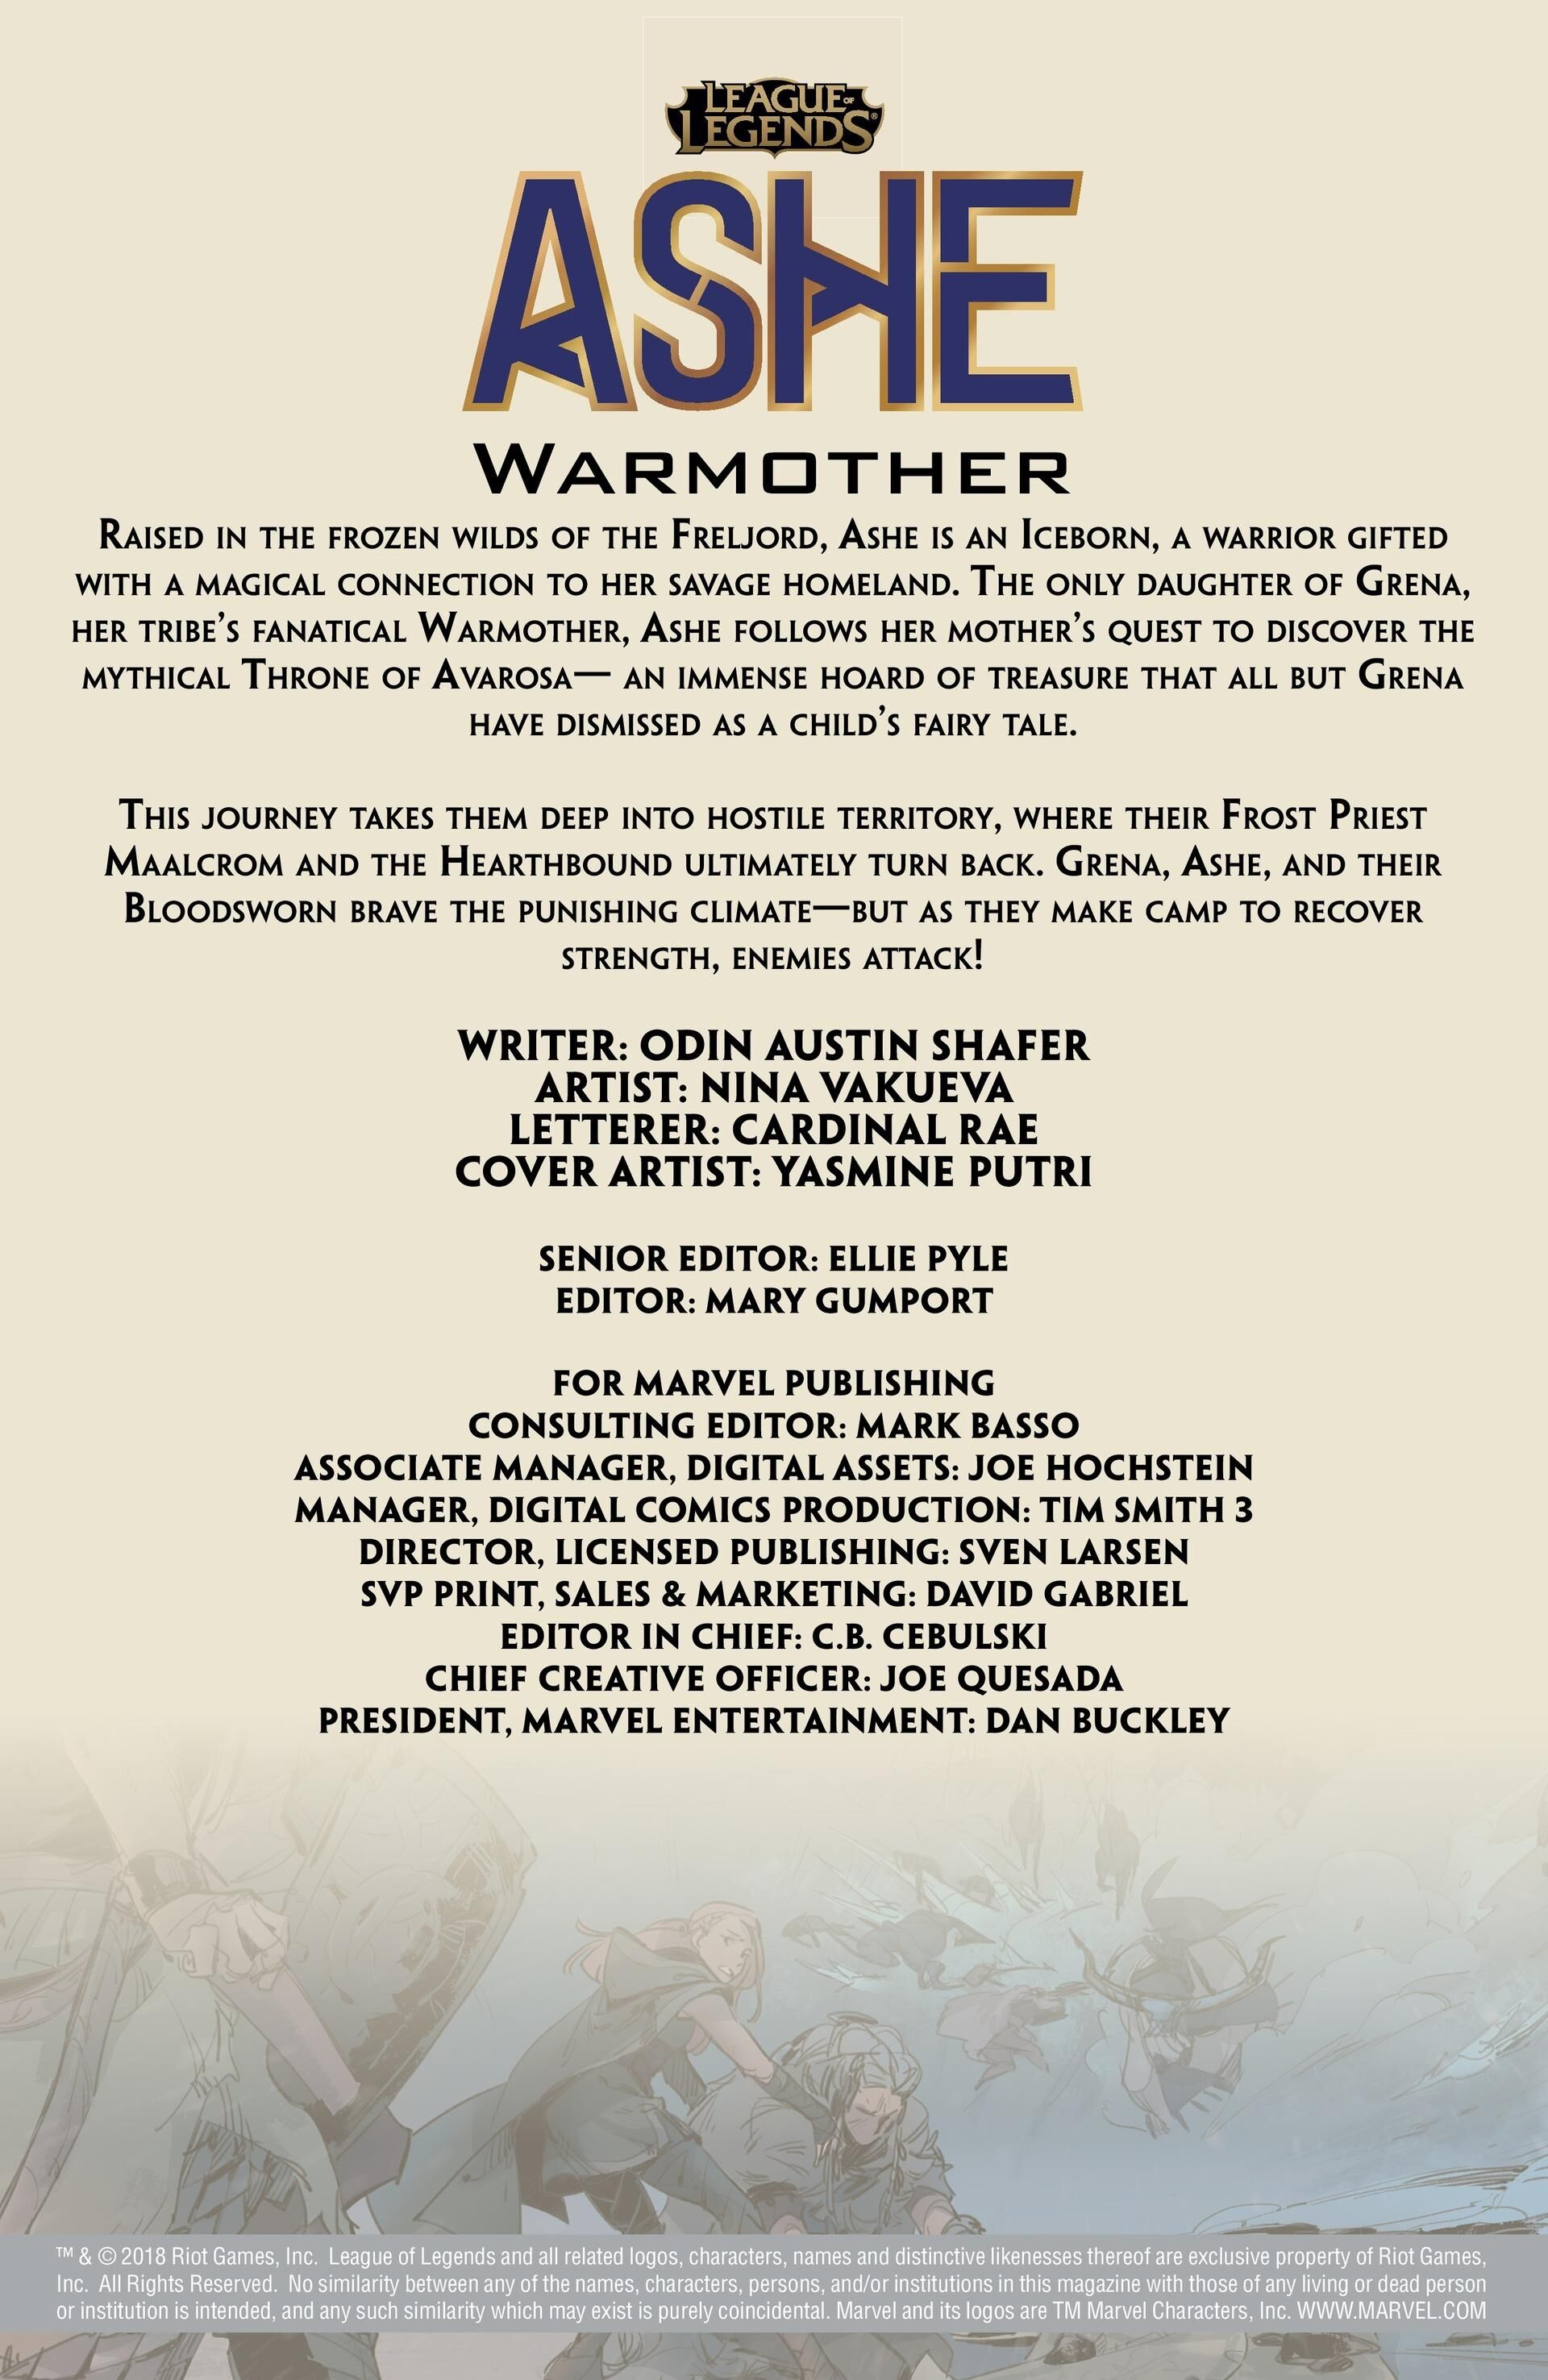 Ashe Warmother 2 pr01.jpg